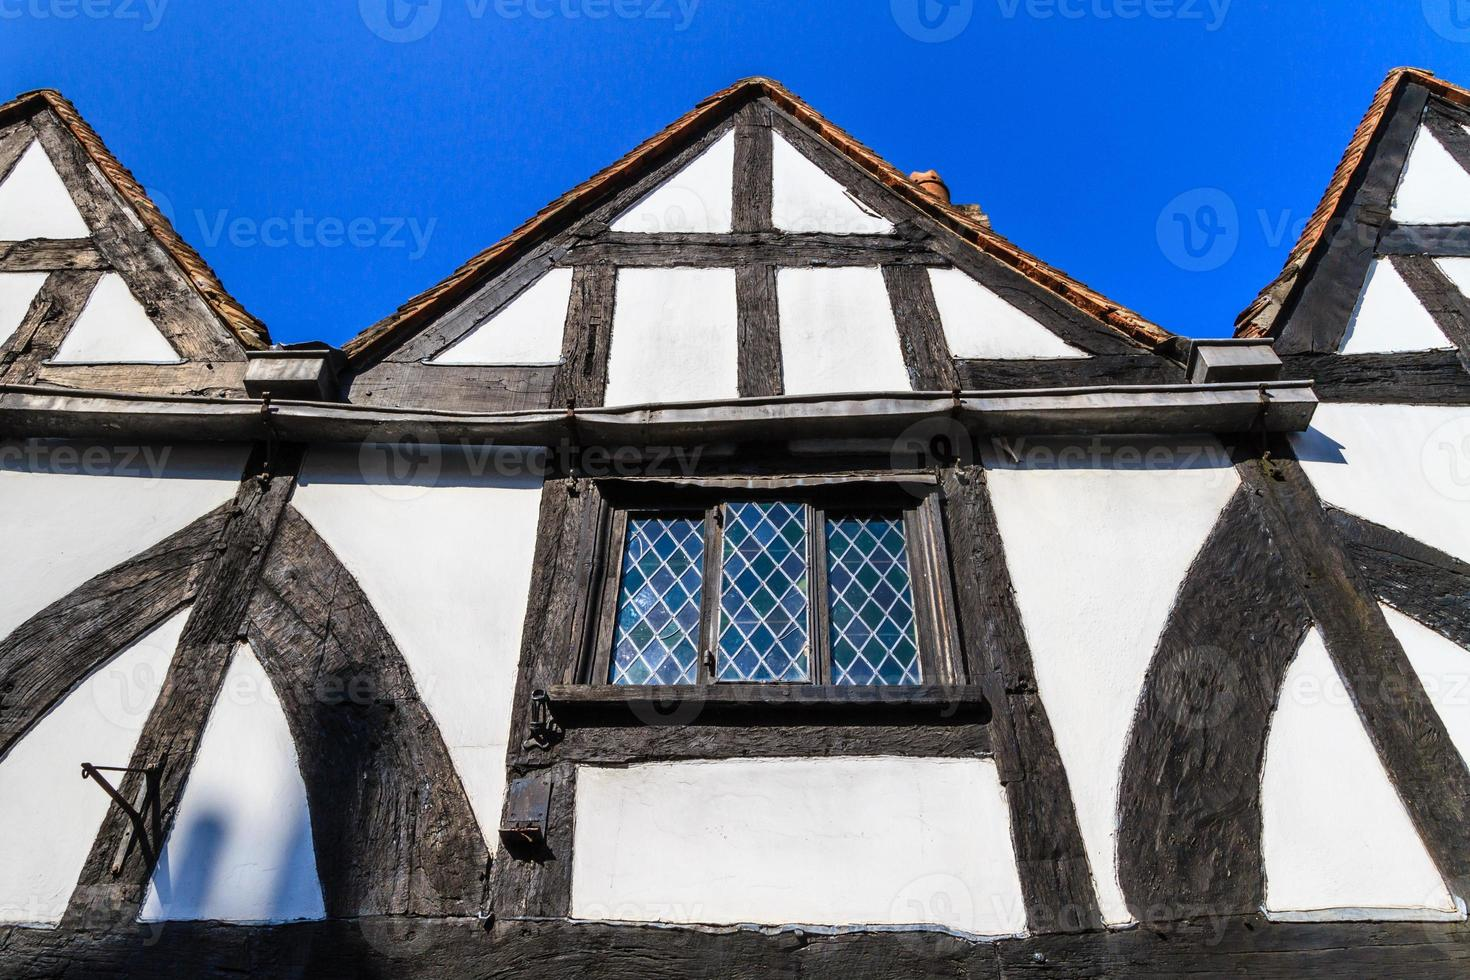 Timber framed house facade photo